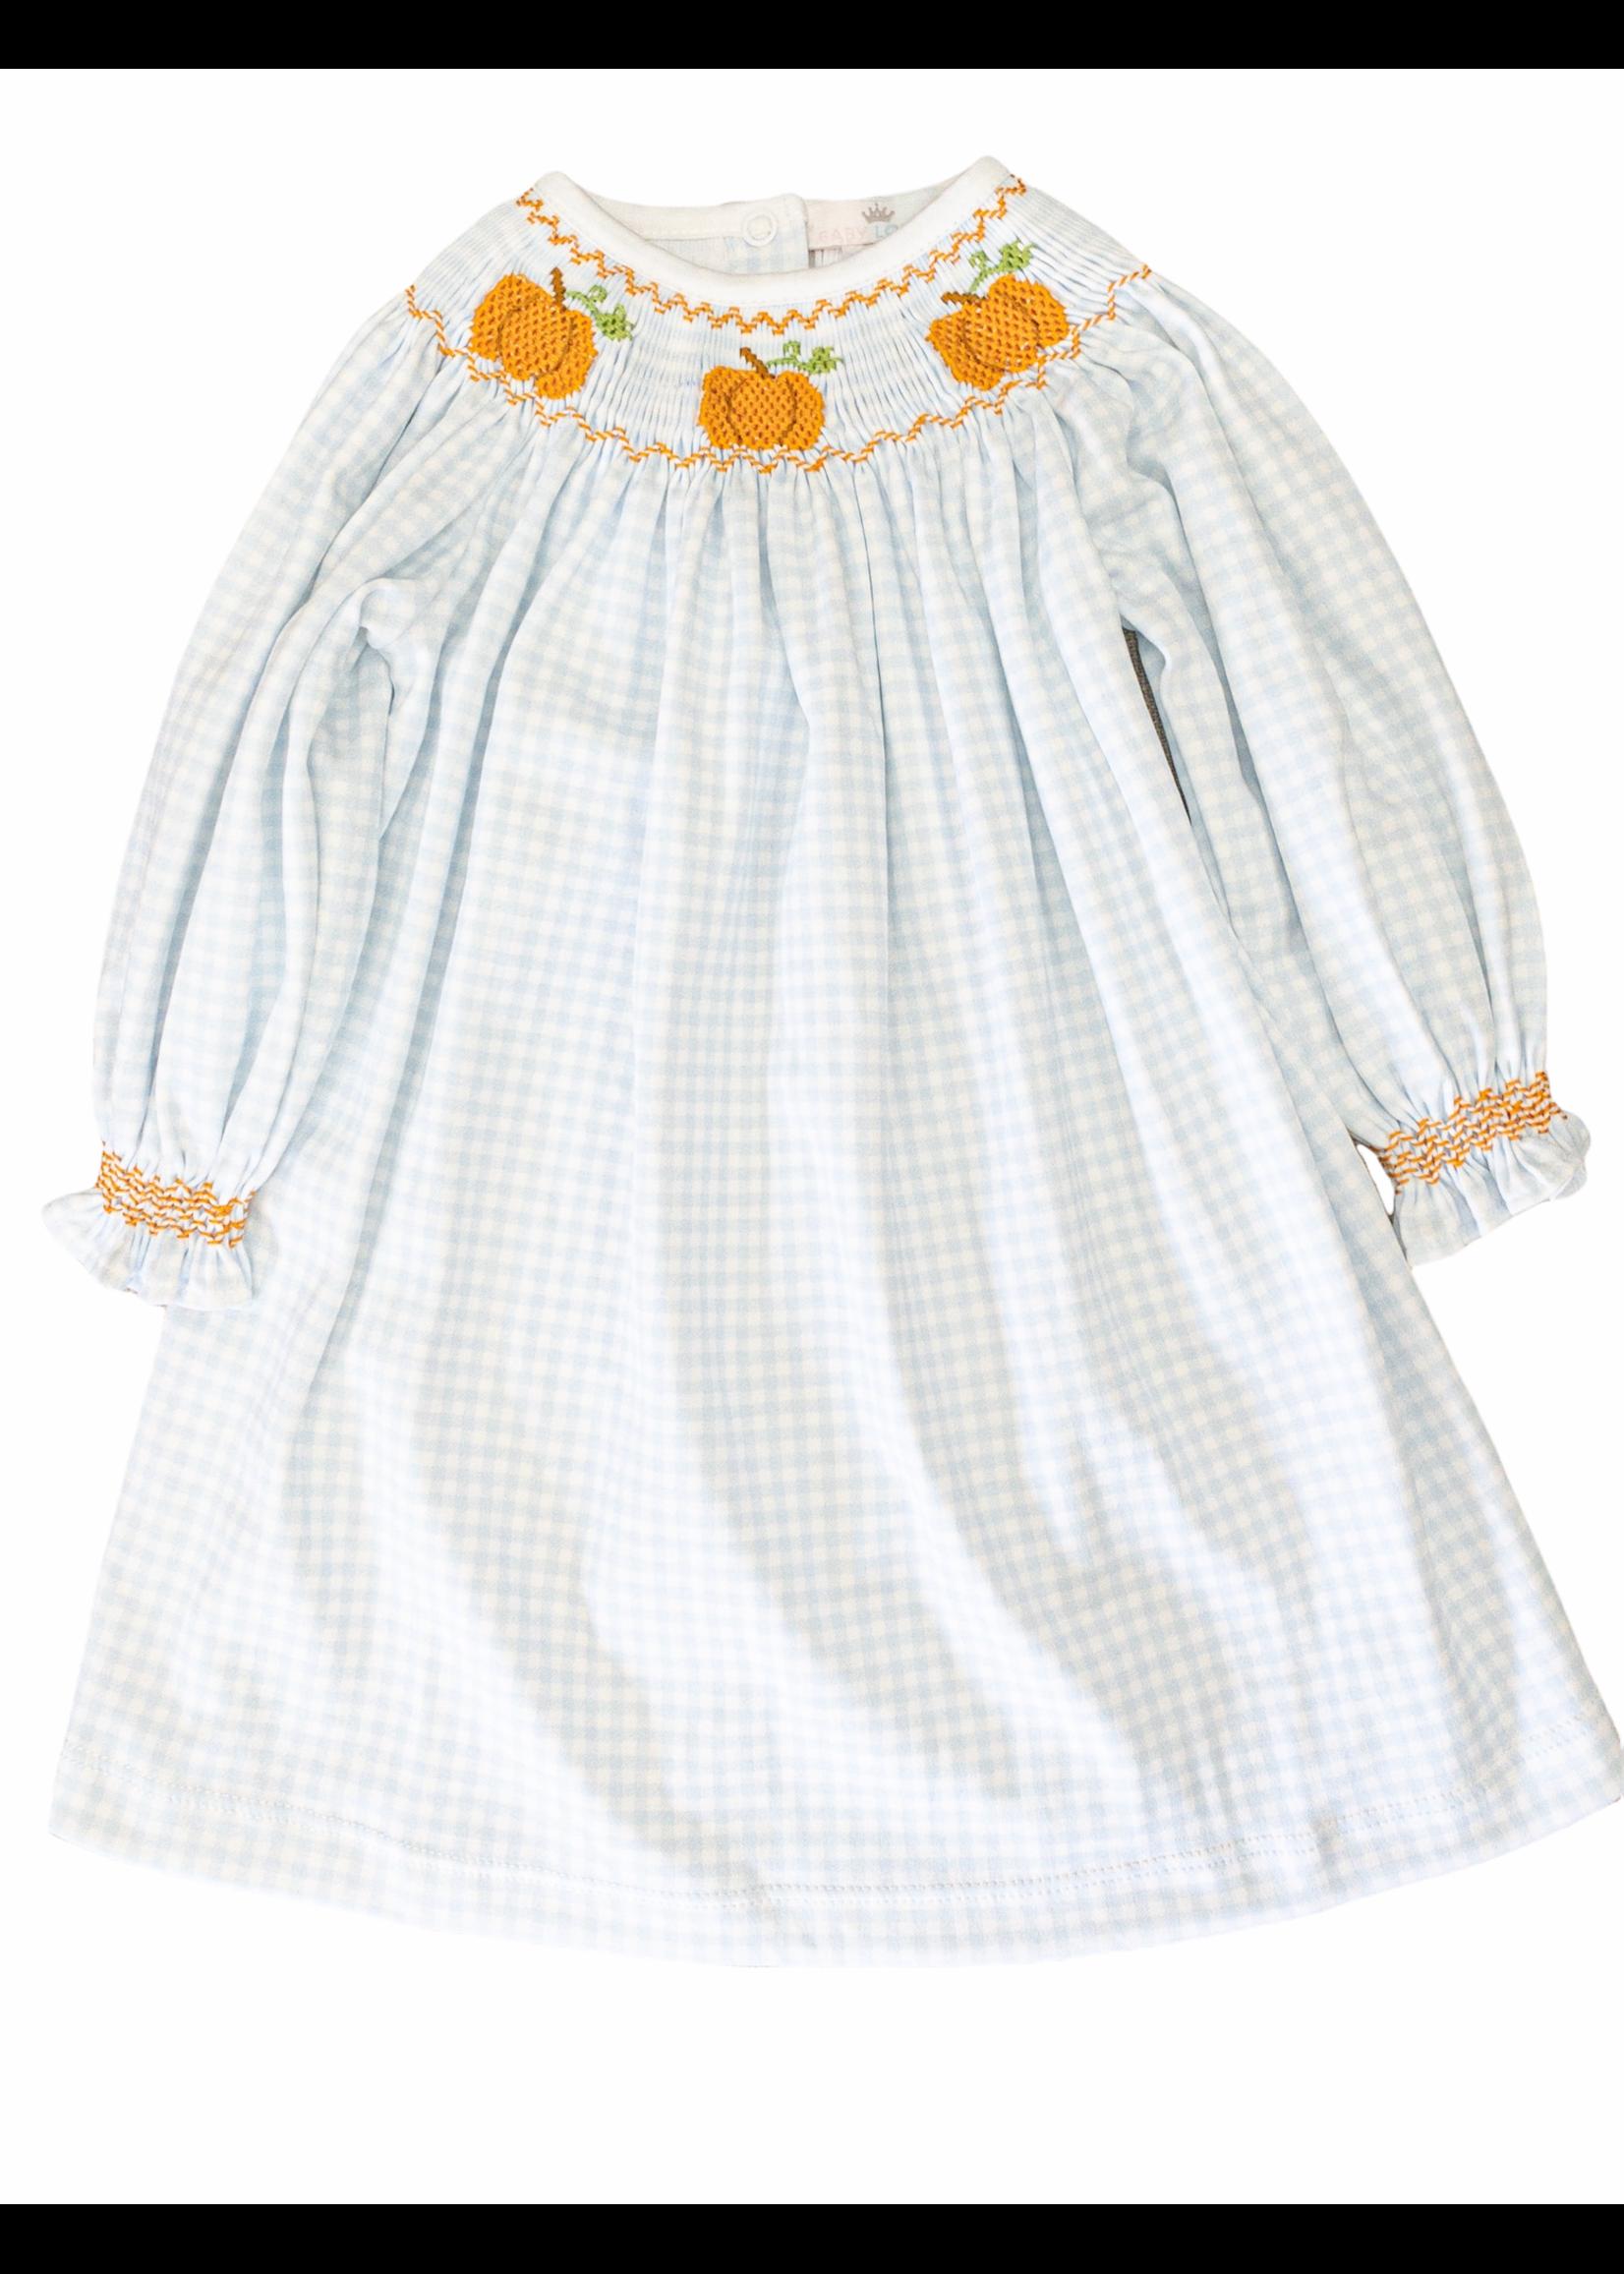 Baby Loren Pumpkin Patch Smocked Dress